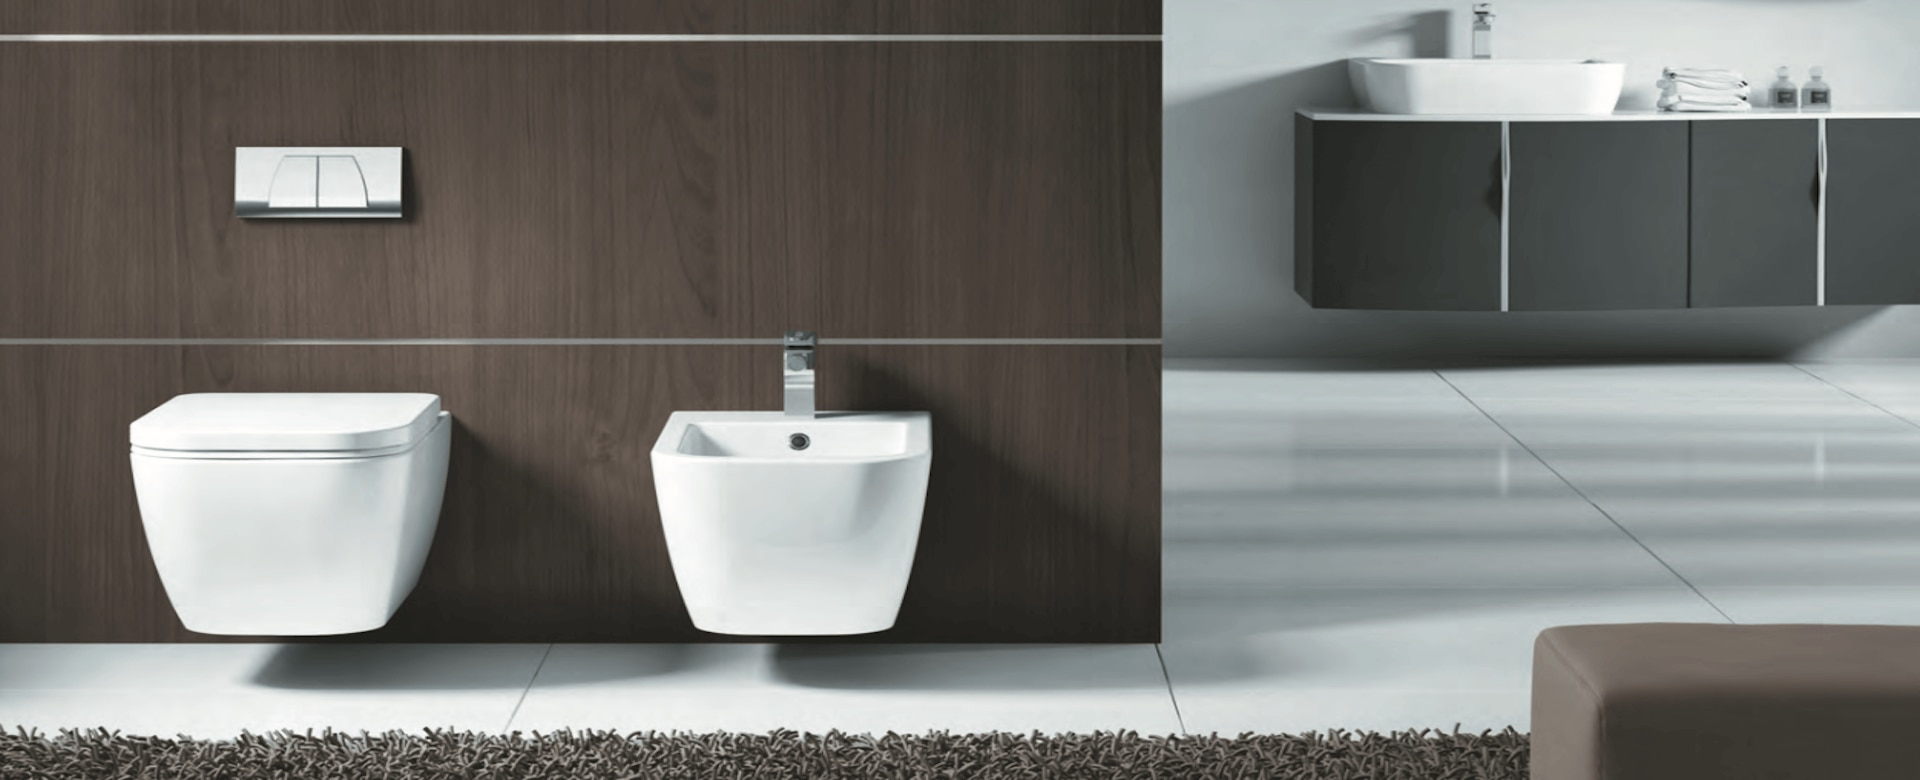 0193cd225c9 update image not found. Luxury Bathroom Solutions ...